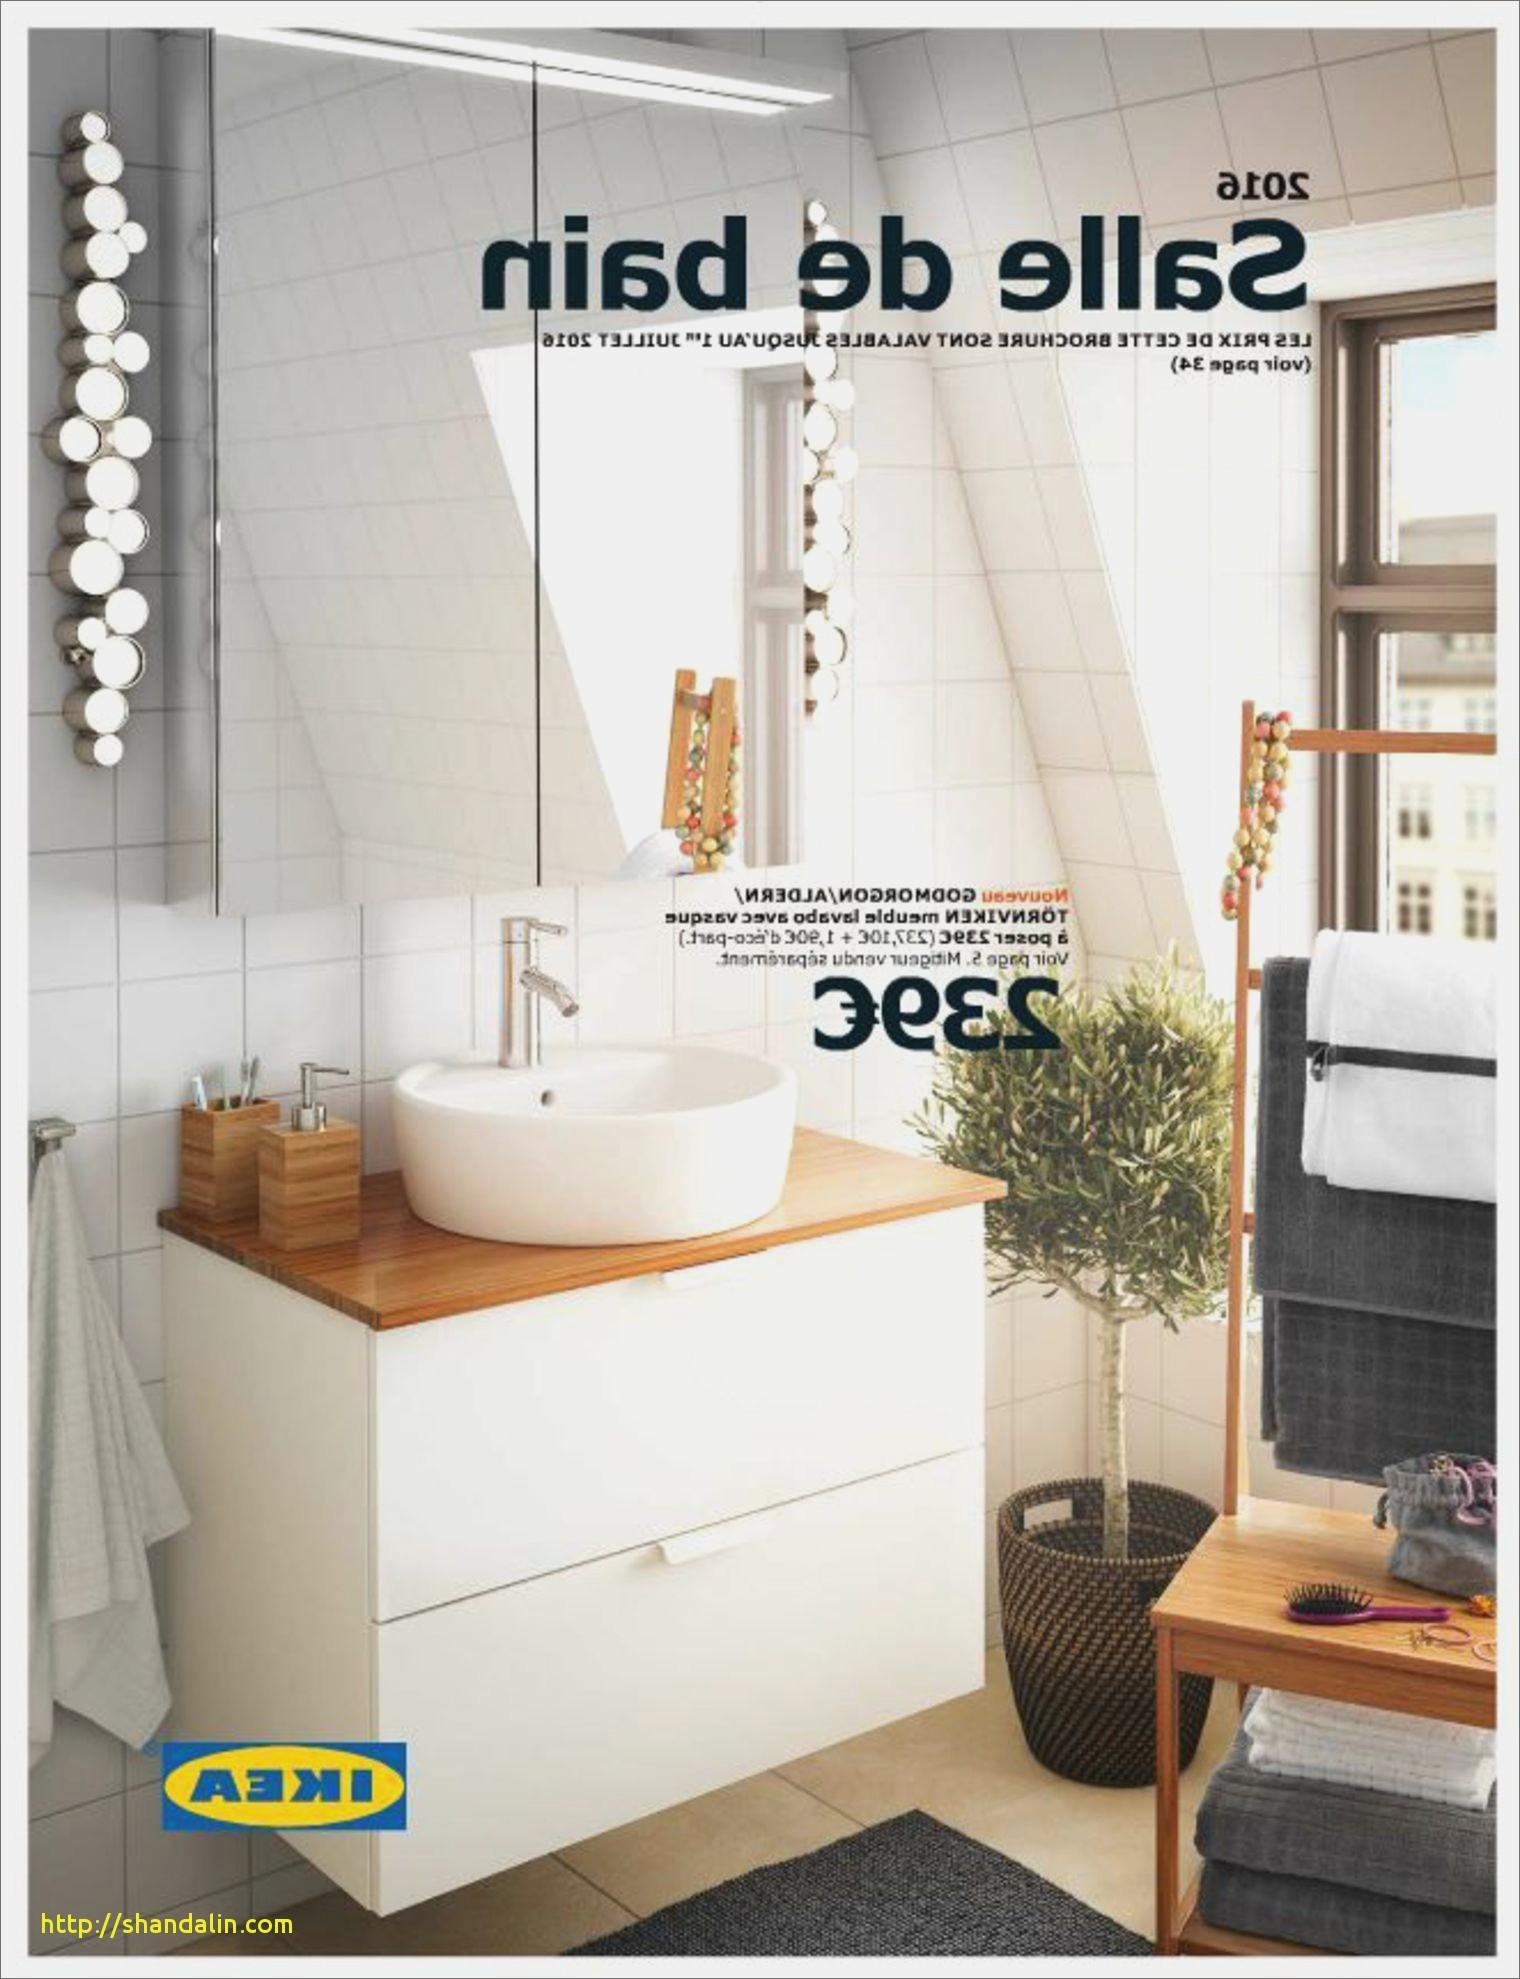 Vasque à Poser Ikea Impressionnant Galerie Article with Tag Double Vasque Chez Ikea